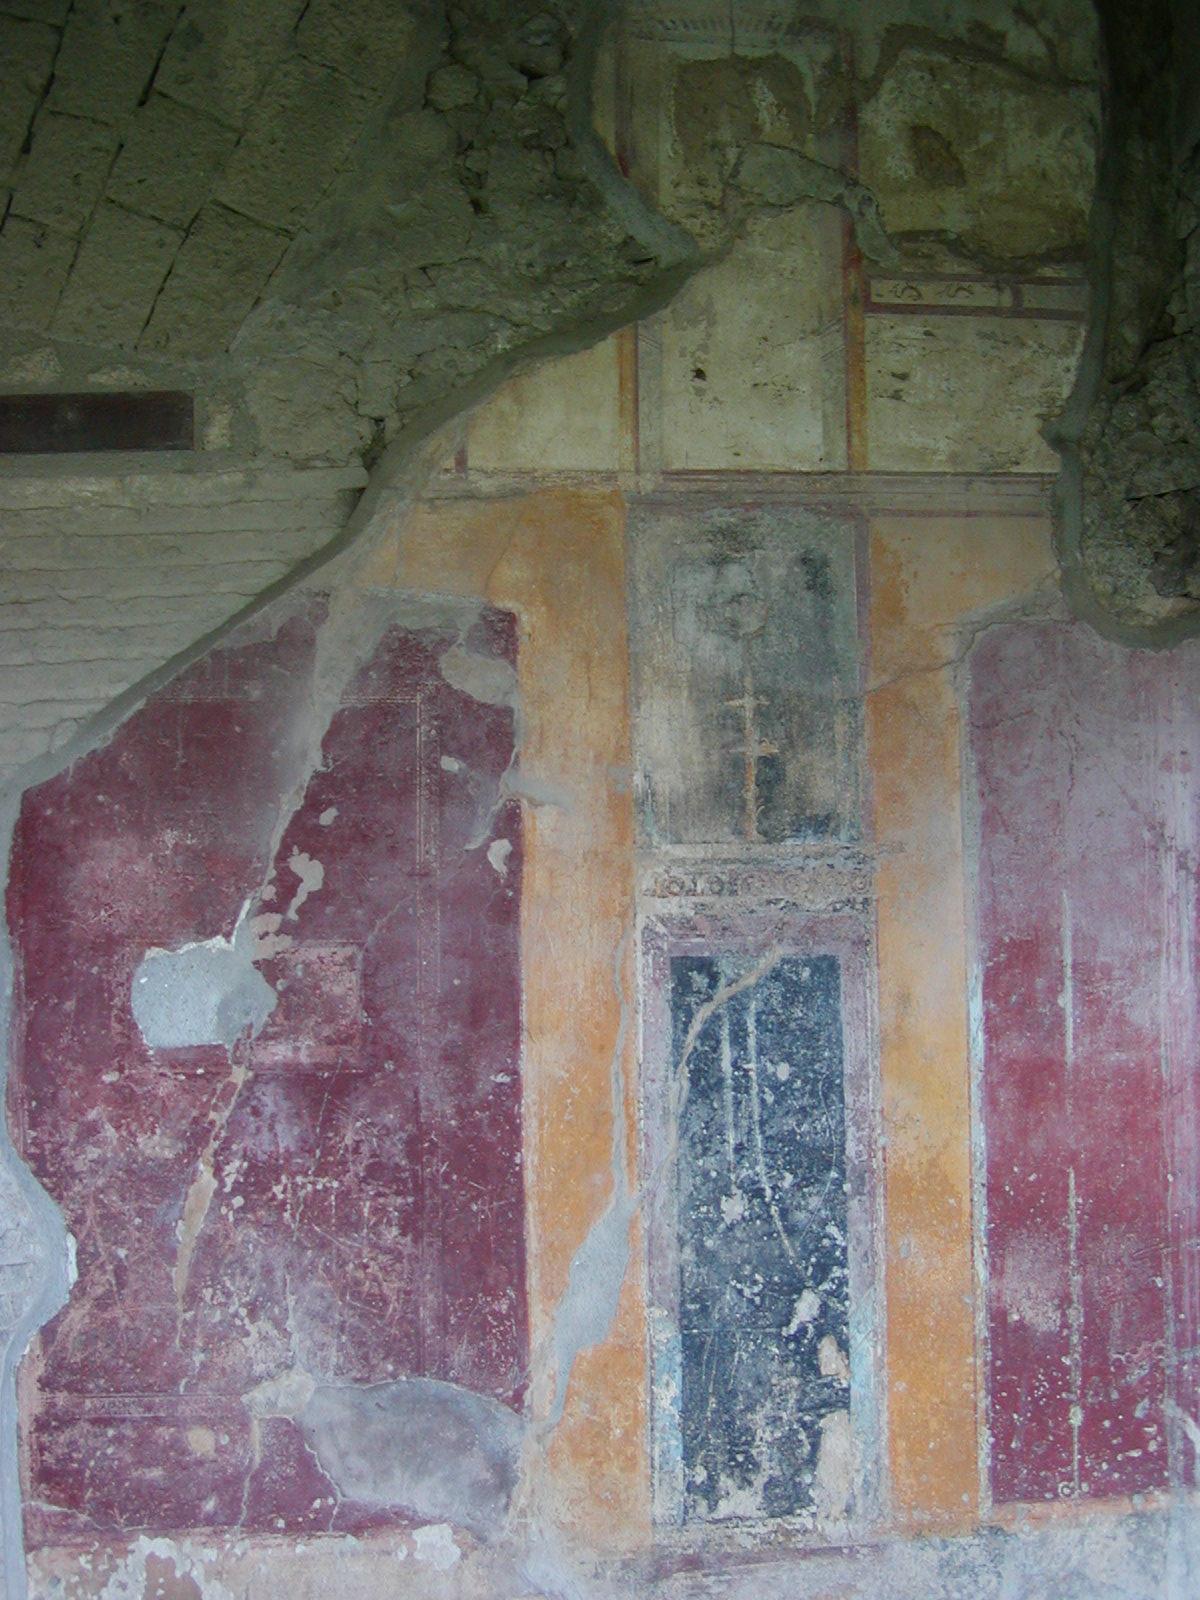 Pompeii - 2002-09-14-173028